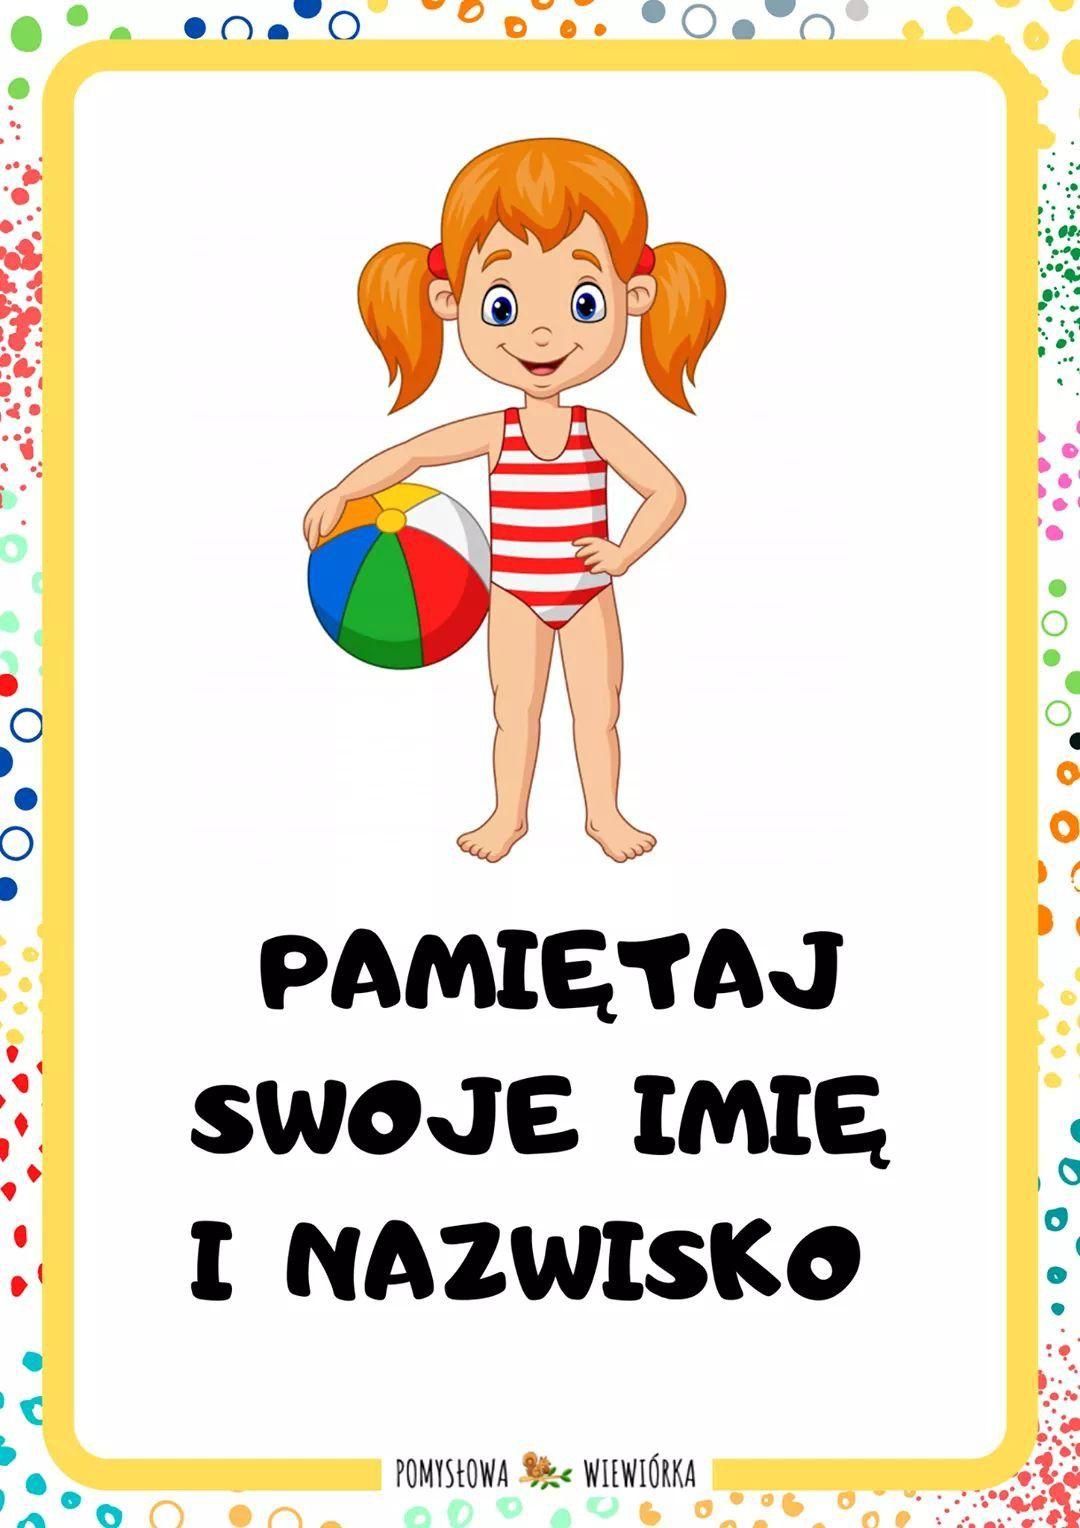 Pin By Bogusia Kaminska On Wakacyjne Porady In 2020 Education Disney Characters Character